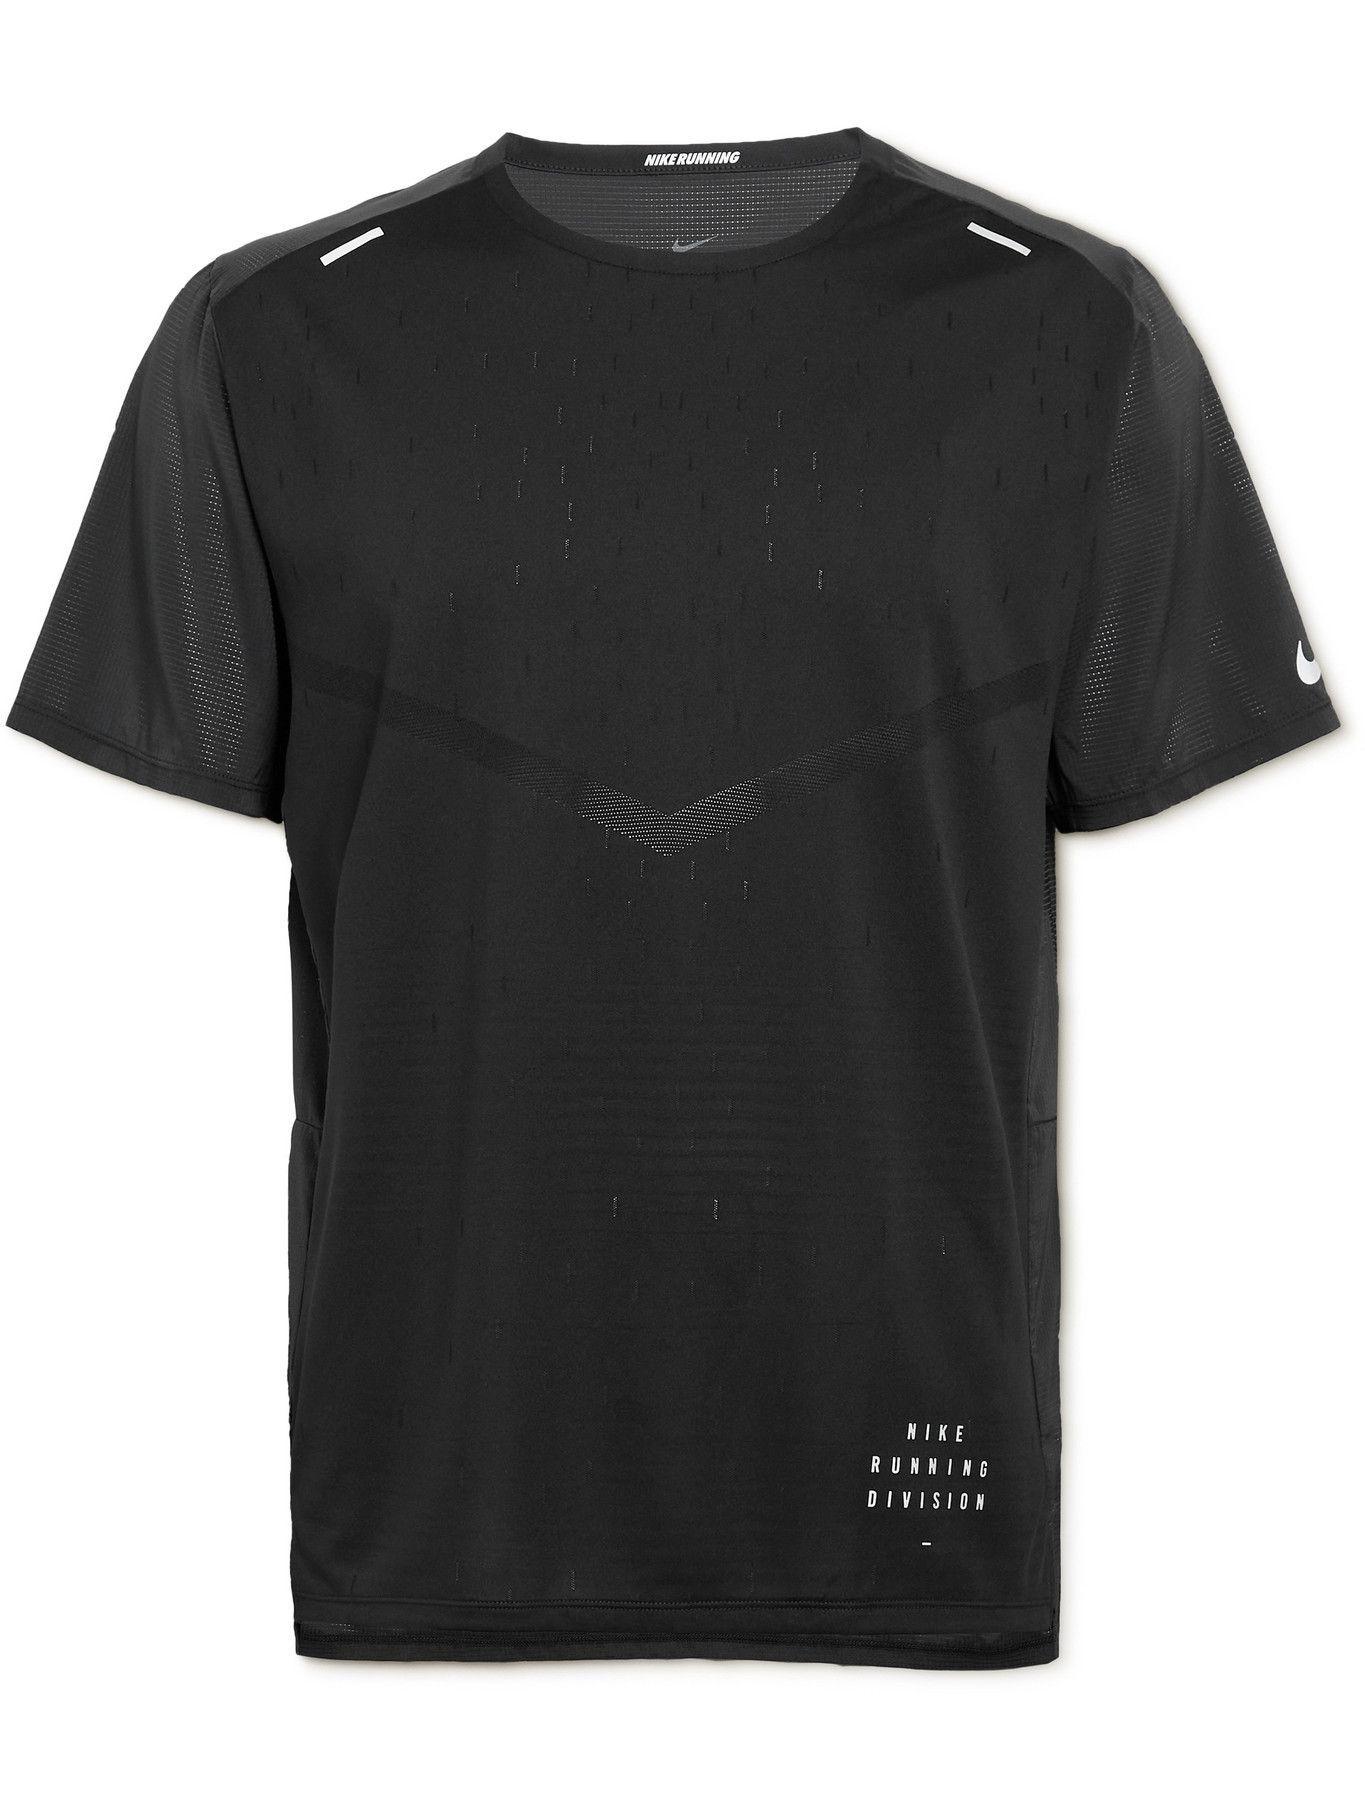 NIKE RUNNING - Rise 365 Run Division Mesh-Panelled Dri-FIT T-Shirt - Black